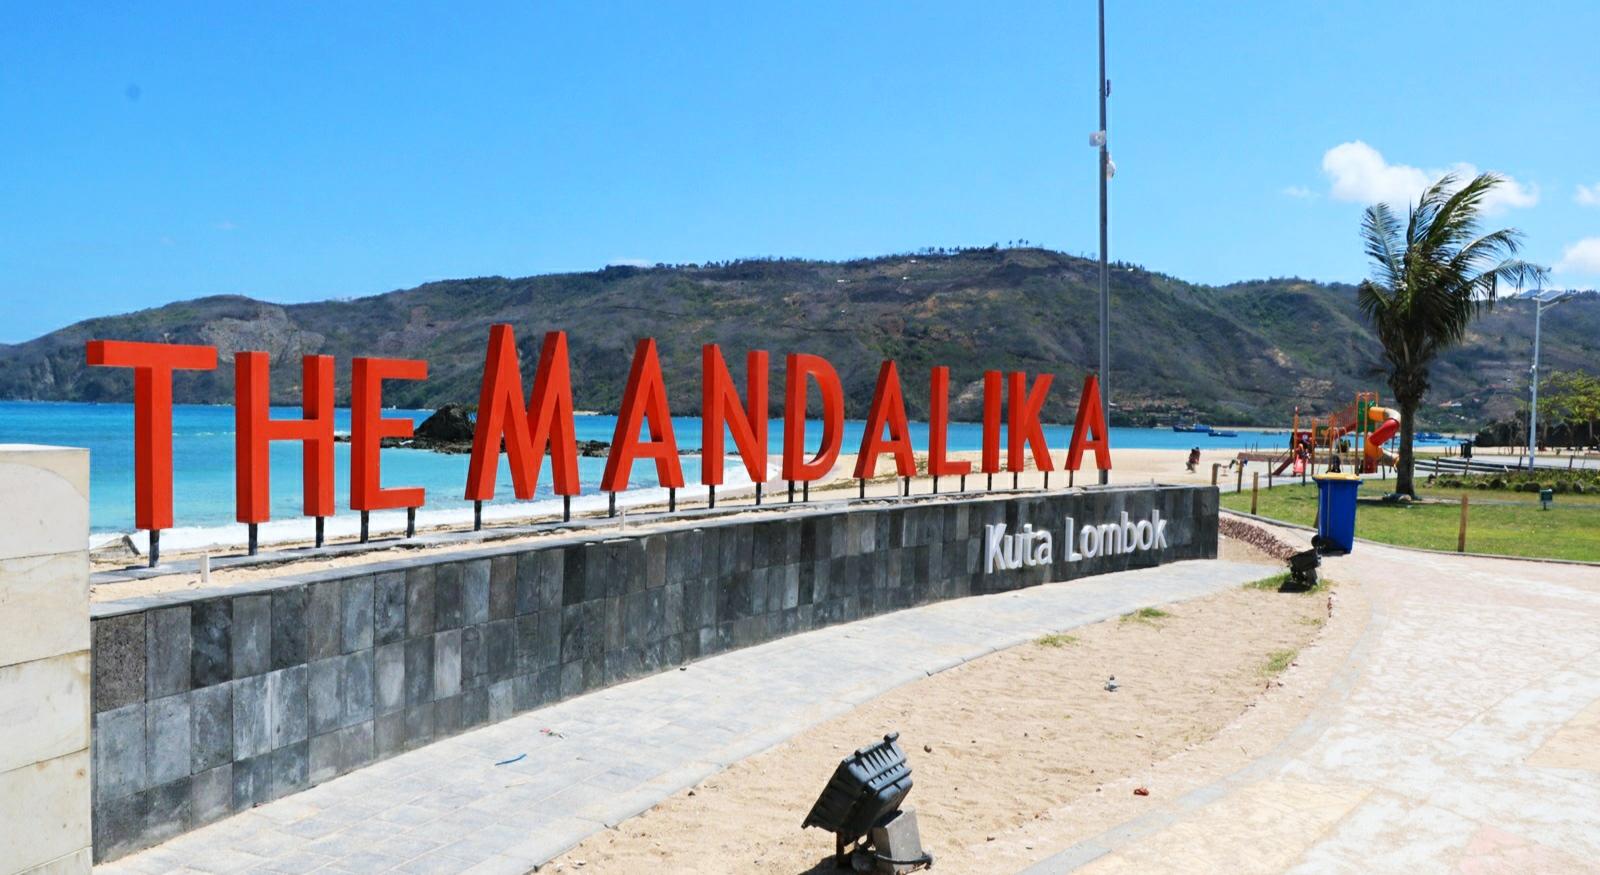 Mandalika to Host International Cycling Event à la Tour de France